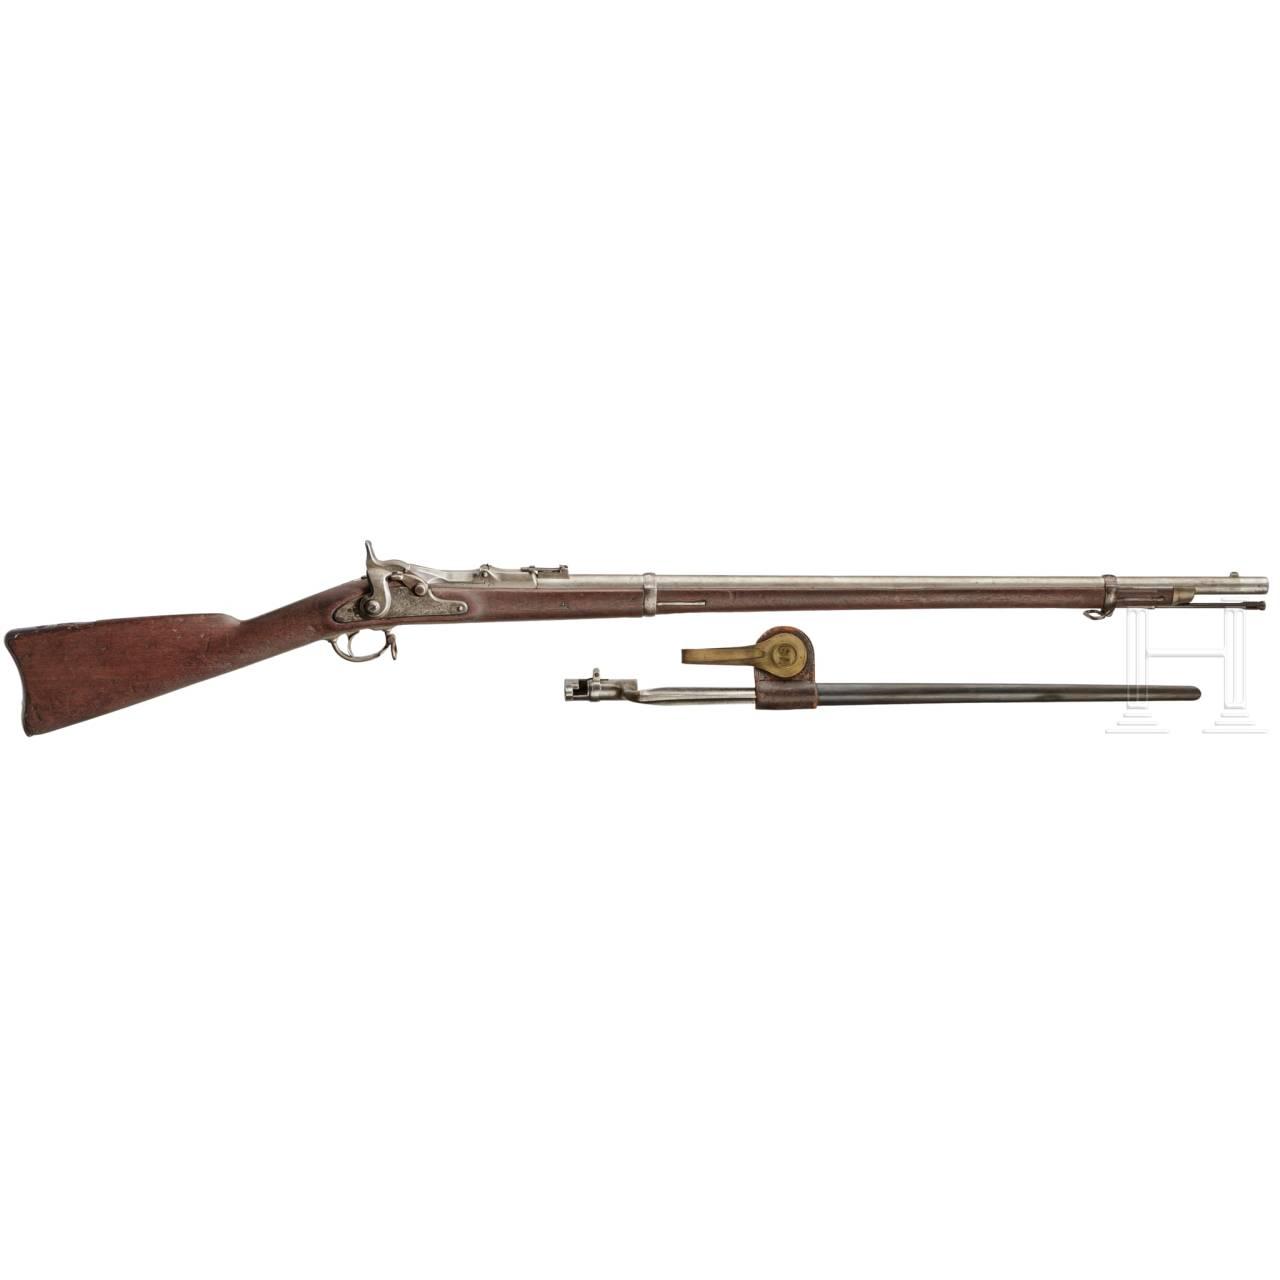 Springfield M 1870 U.S. Trapdoor Rifle